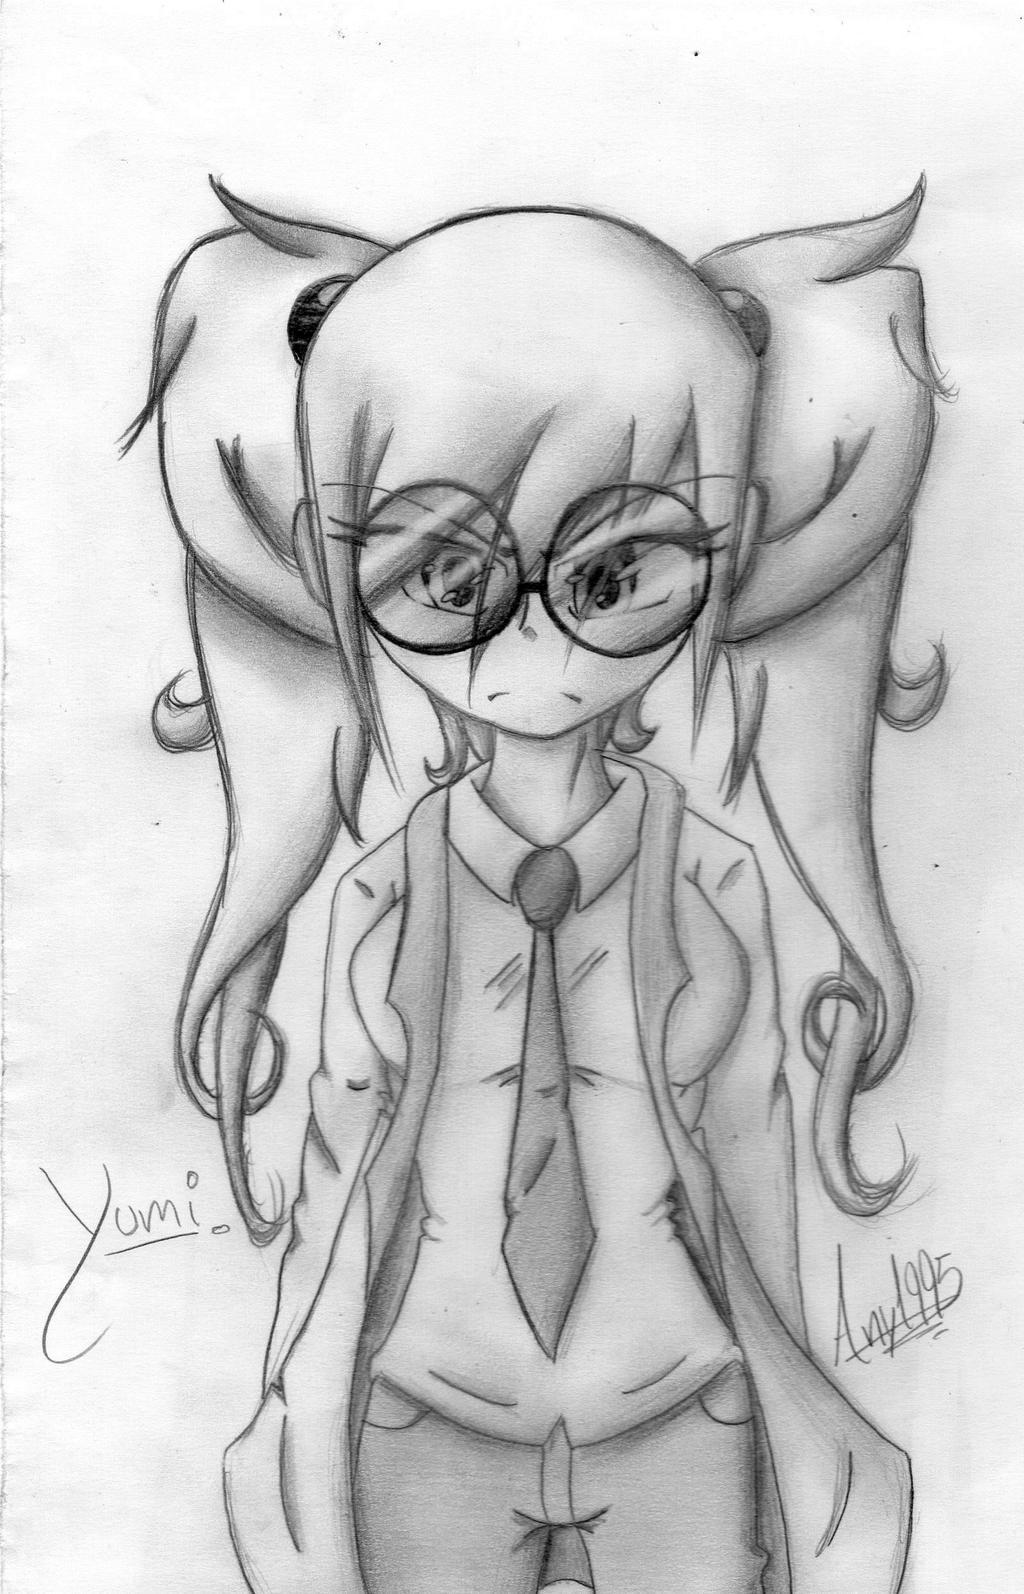 Sketch -Yumi- by Any1995